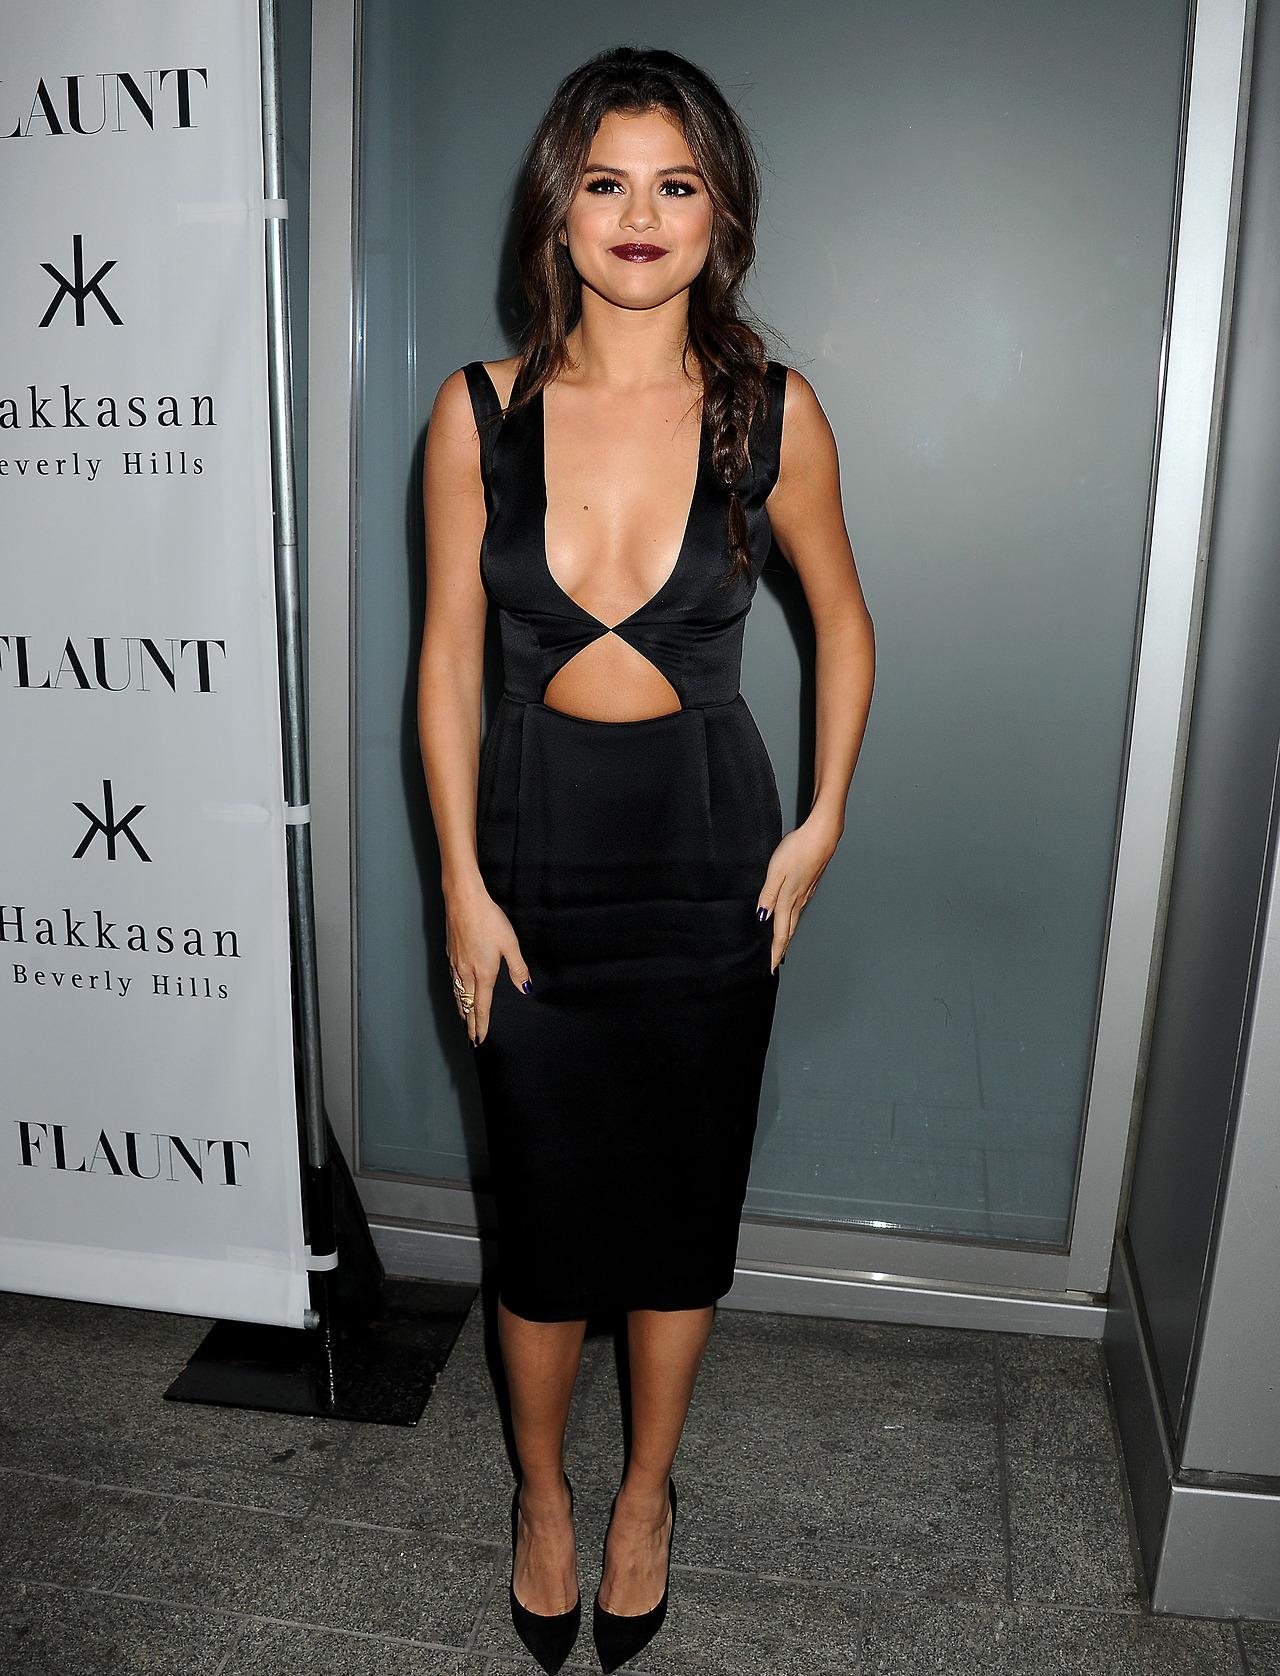 Recommend Selena gomez flaunt please You